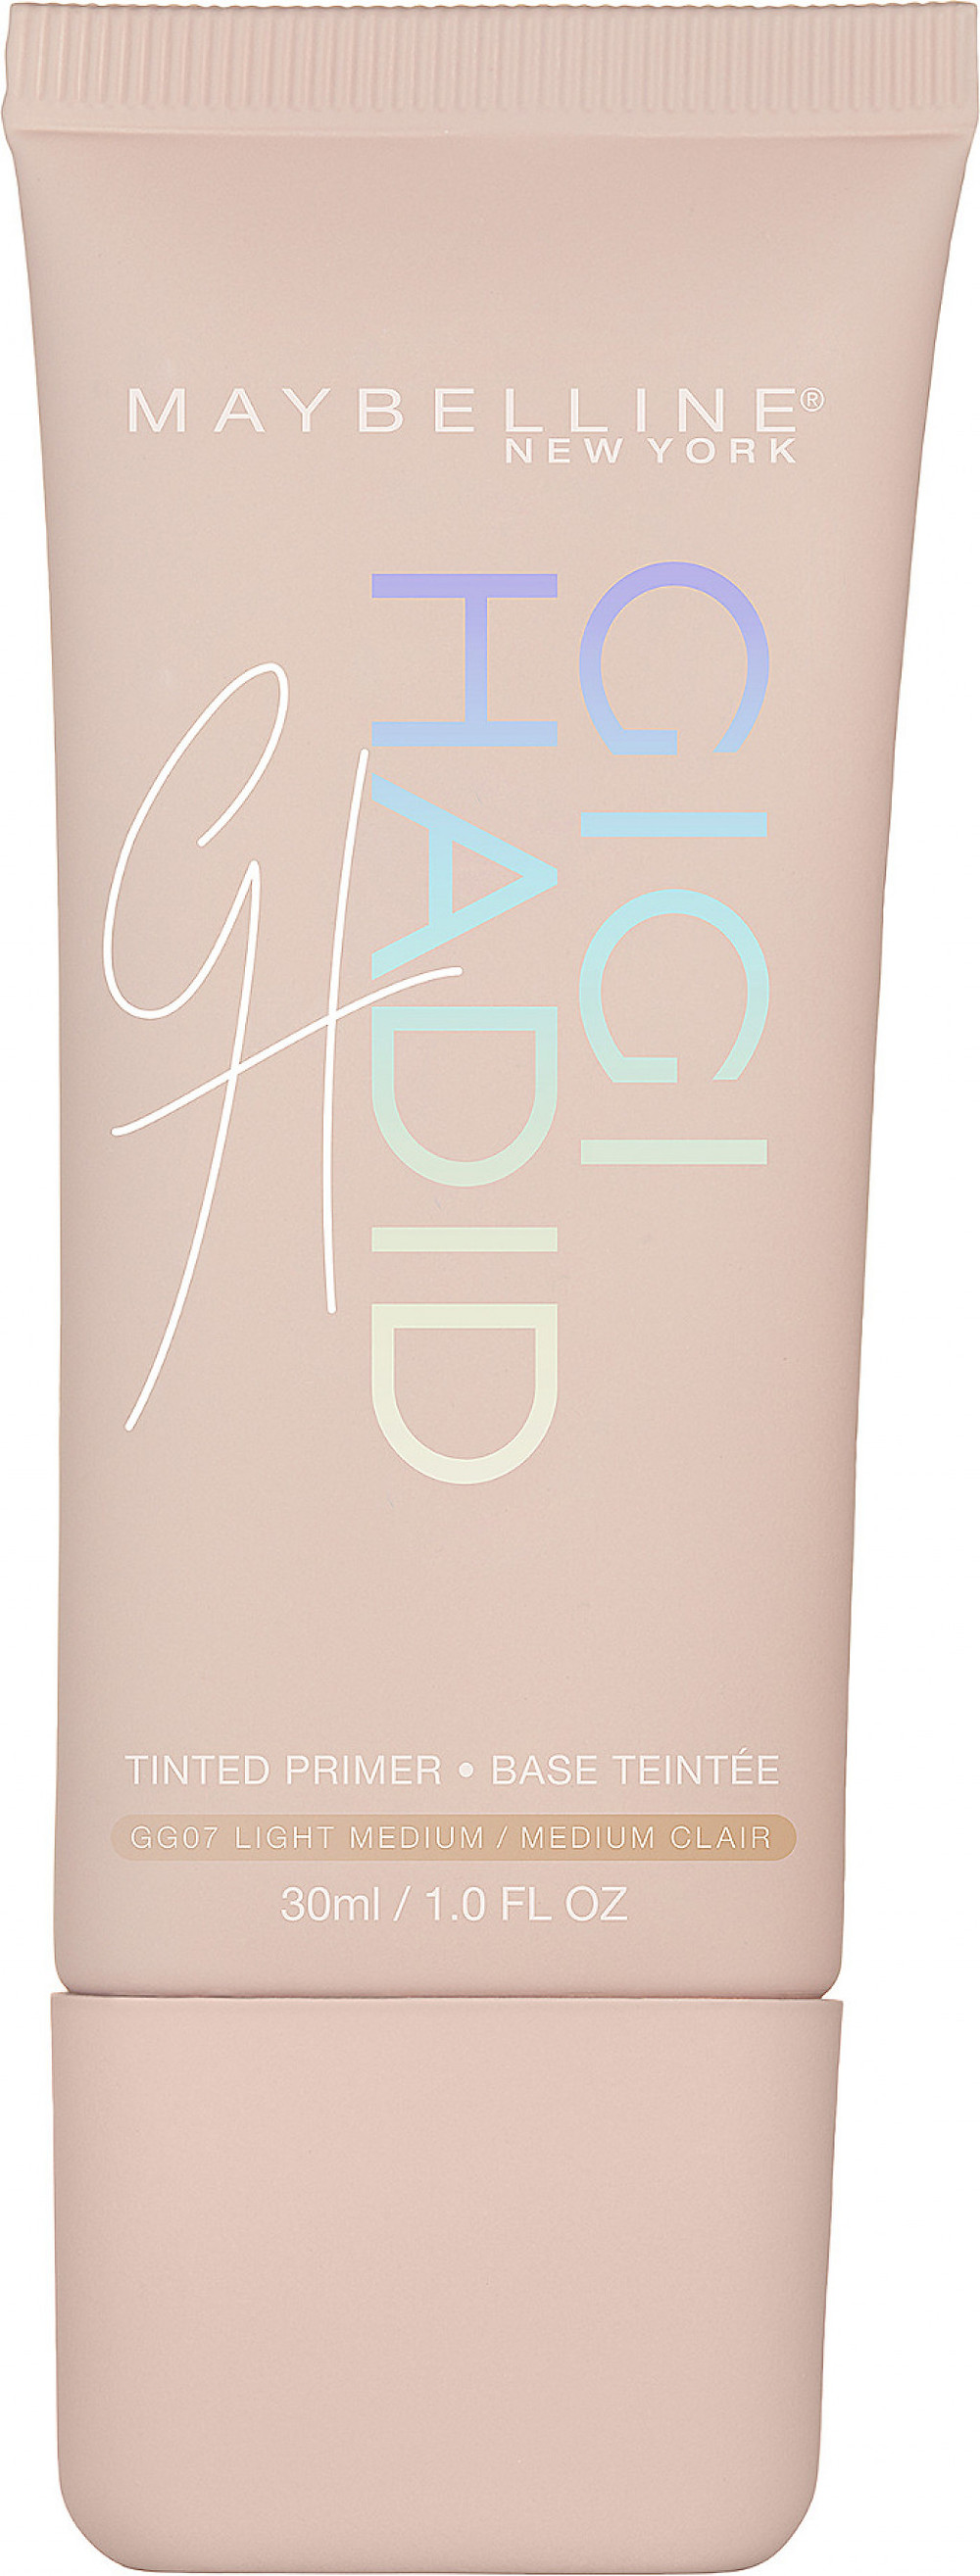 Maybelline Gigi Hadid East Coast Tinted Primer | UK Makeup News | FYI Beauty